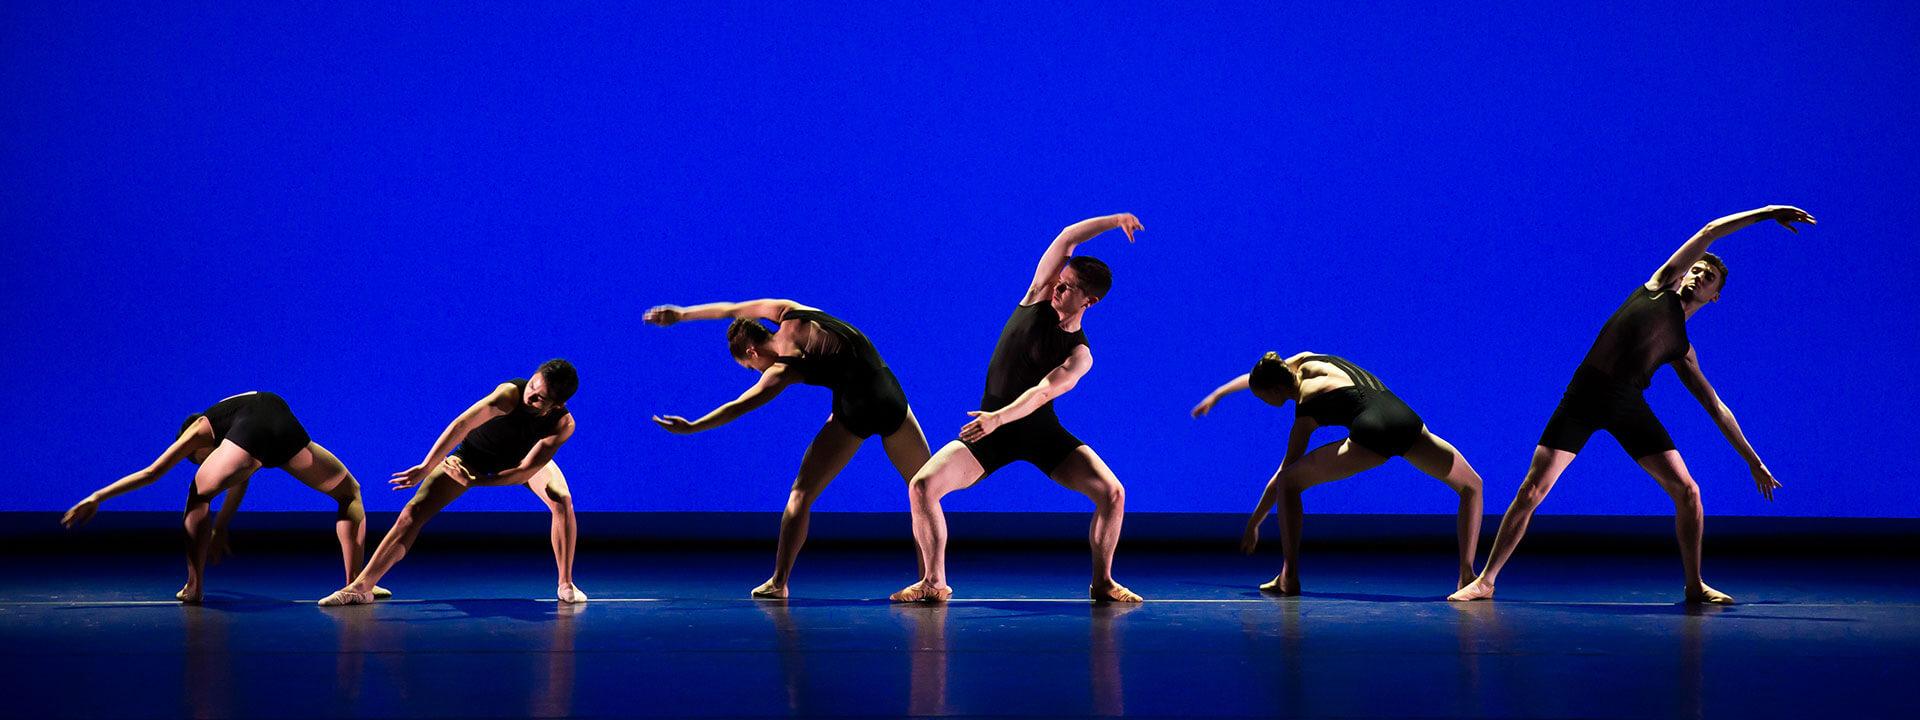 Vocational Dance Training Online Summer School (16+) Image